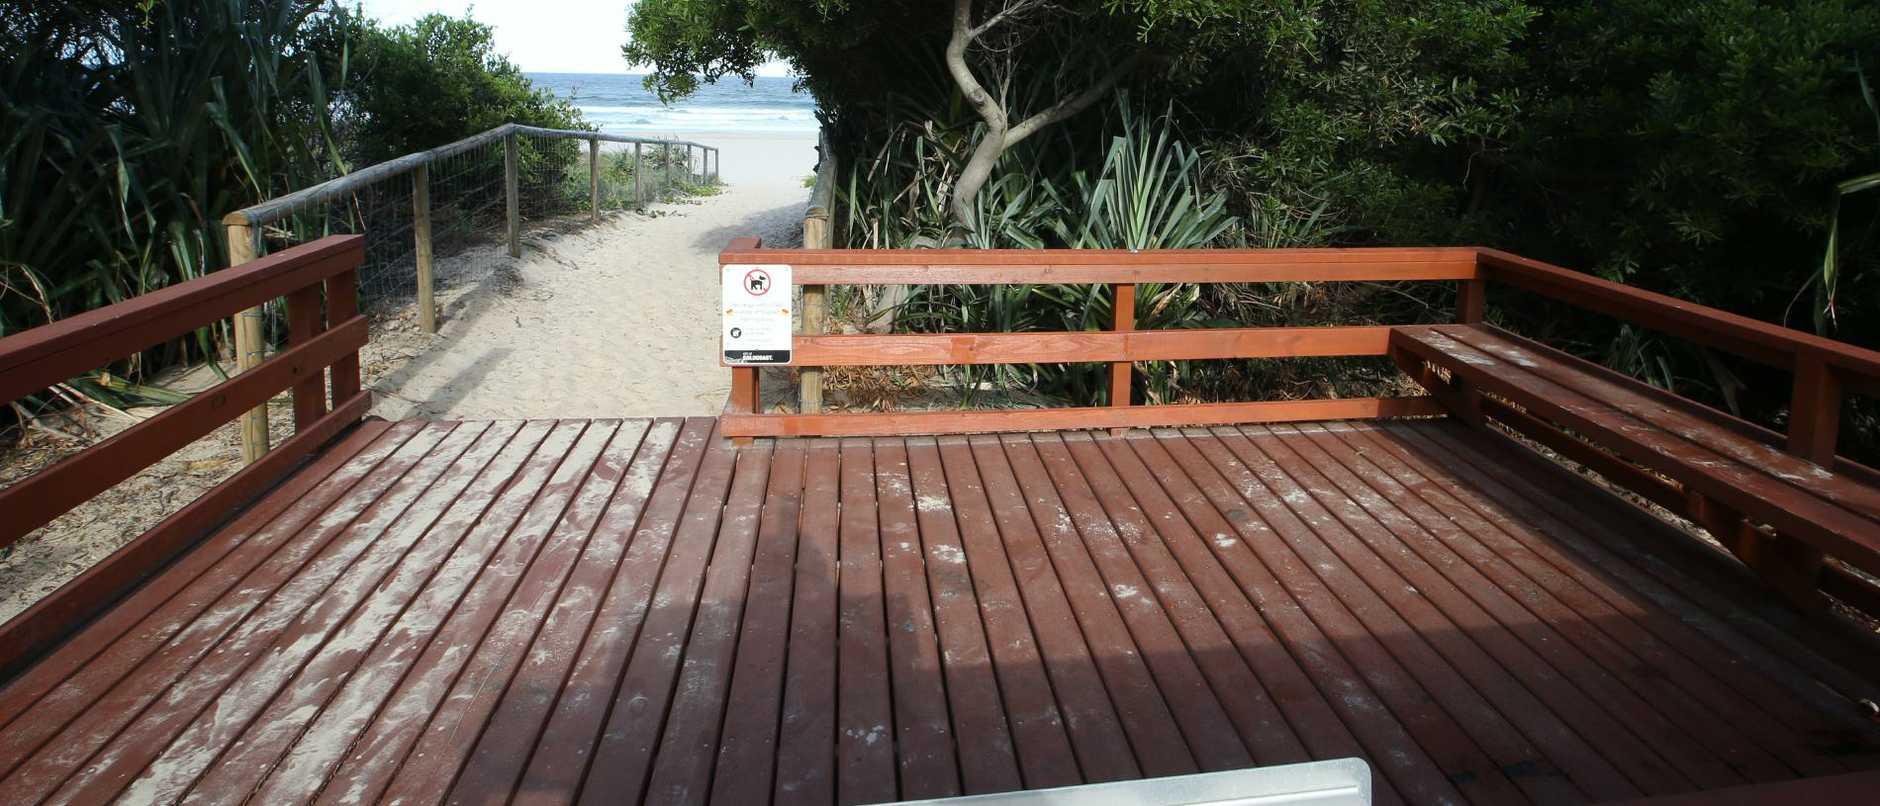 Sydney Hamilton Family Park at Surfers Paradise. Picture Glenn Hampson